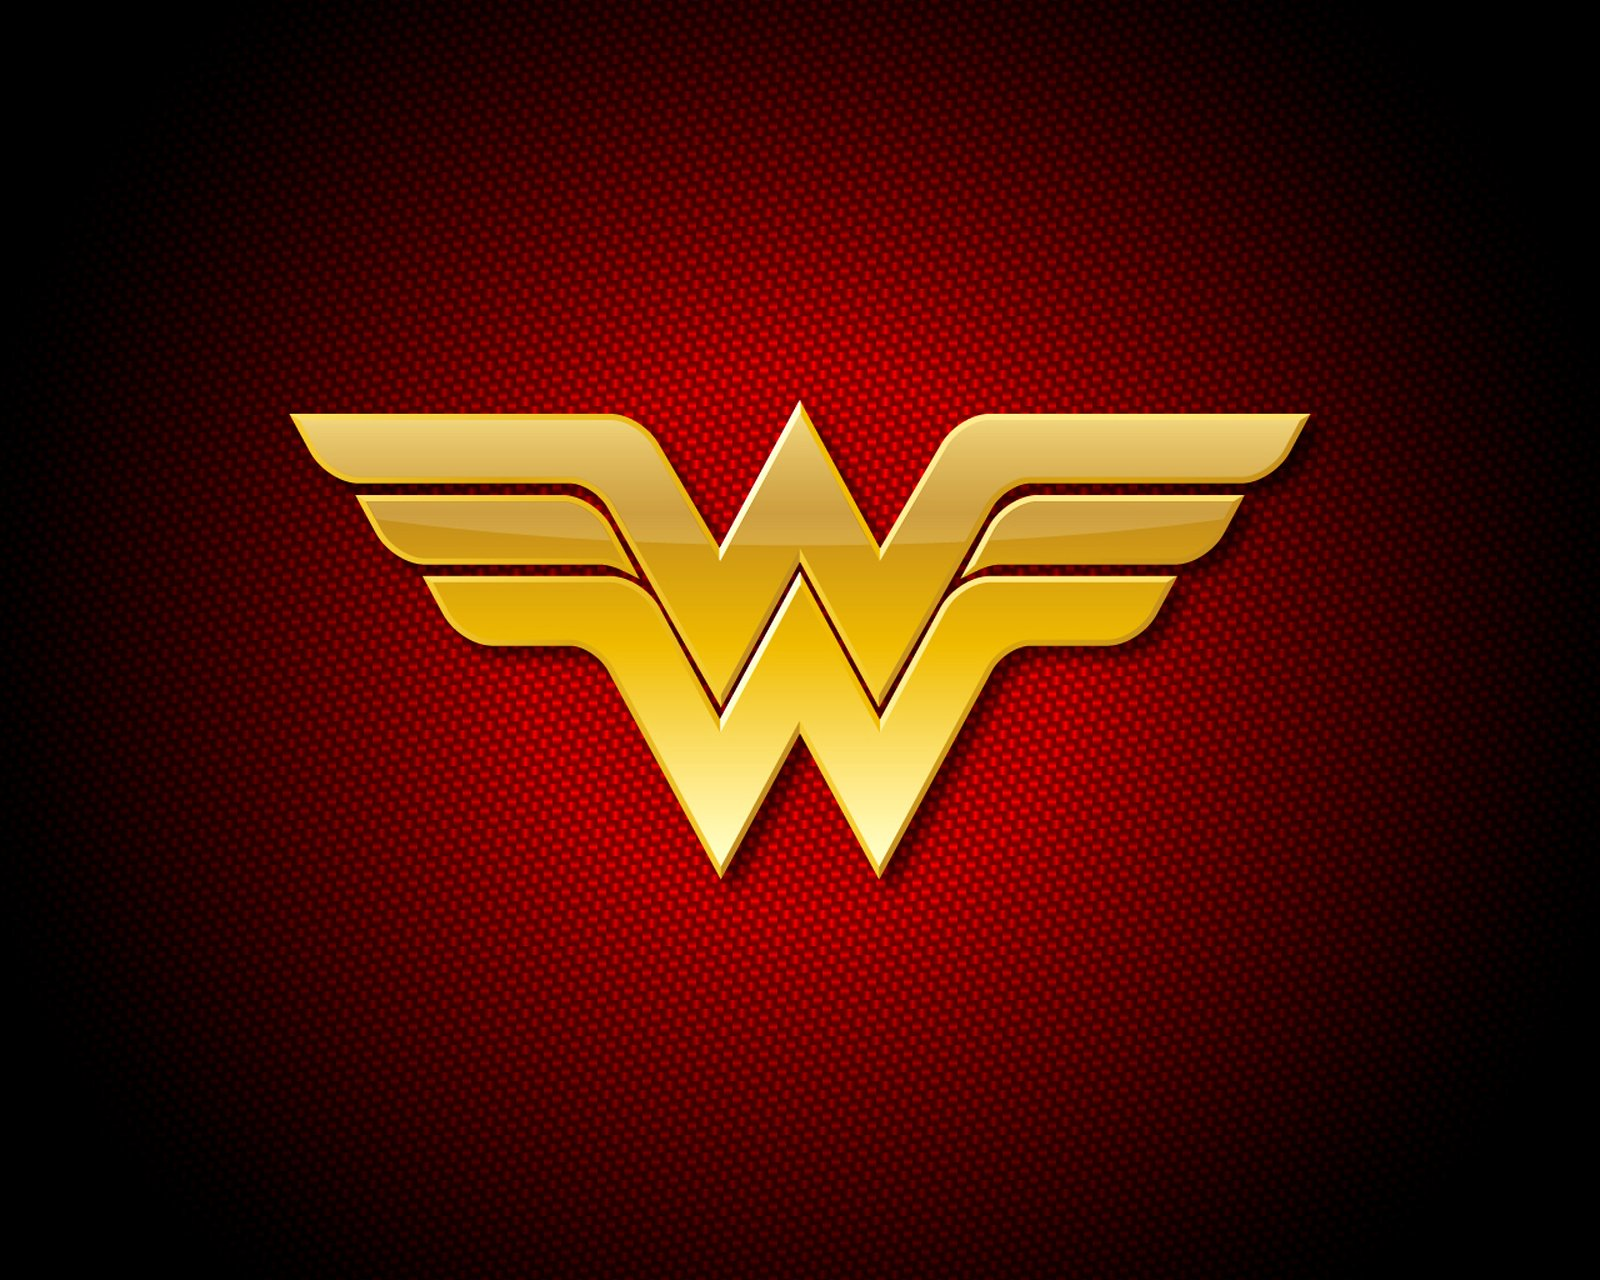 72 Wonder Woman Logo Wallpaper On Wallpapersafari